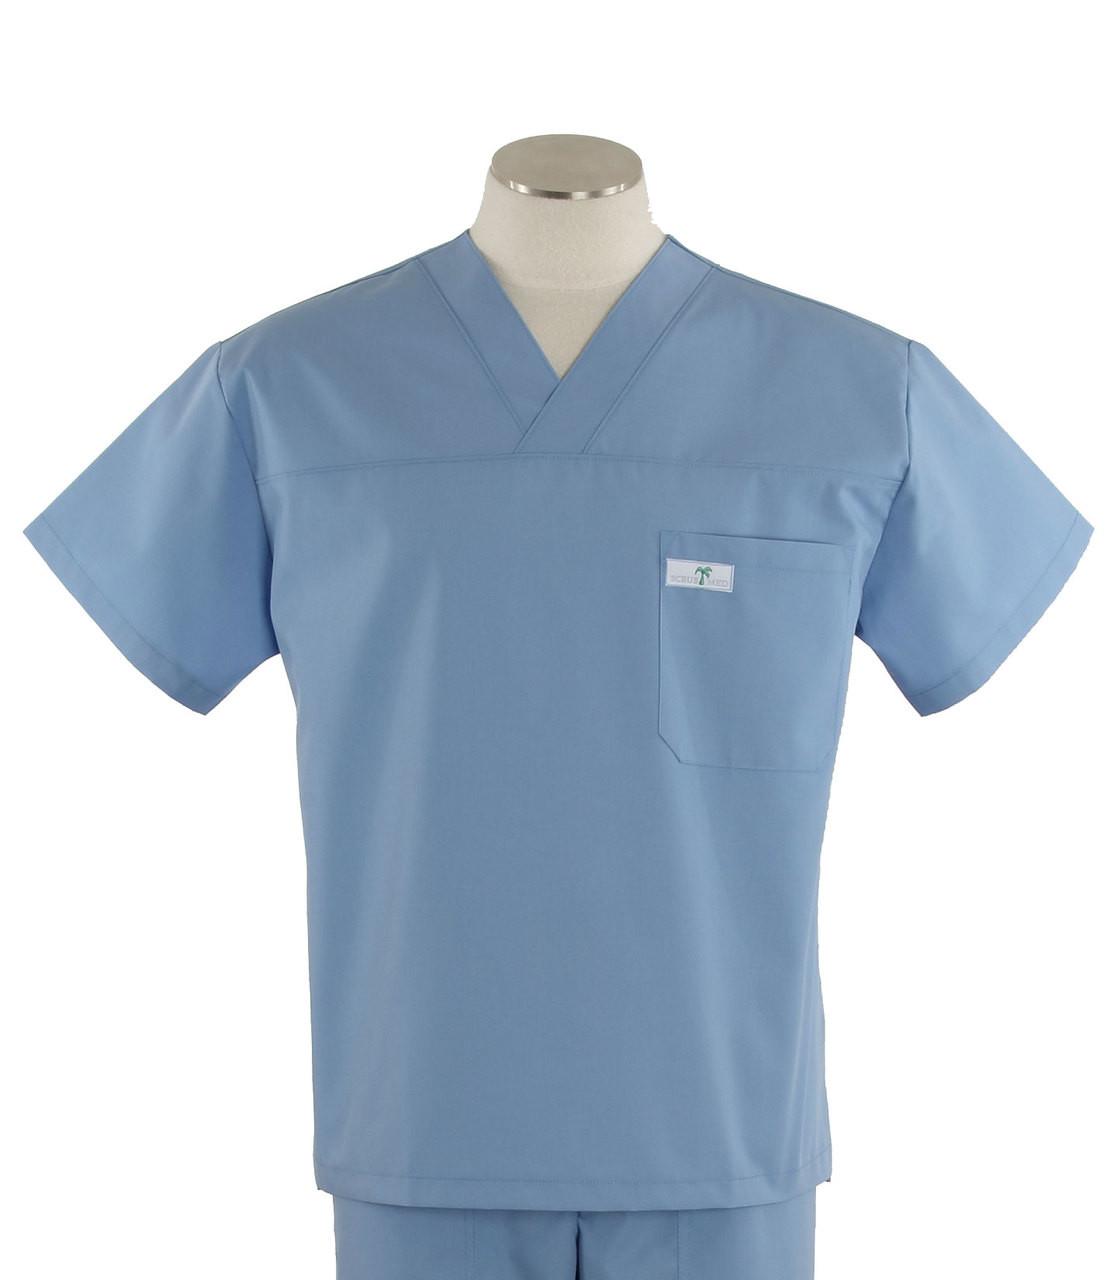 cbdef067356 Scrub Med Mens Solid V-Neck Scrub Top Celestial Blue - Scrub Med